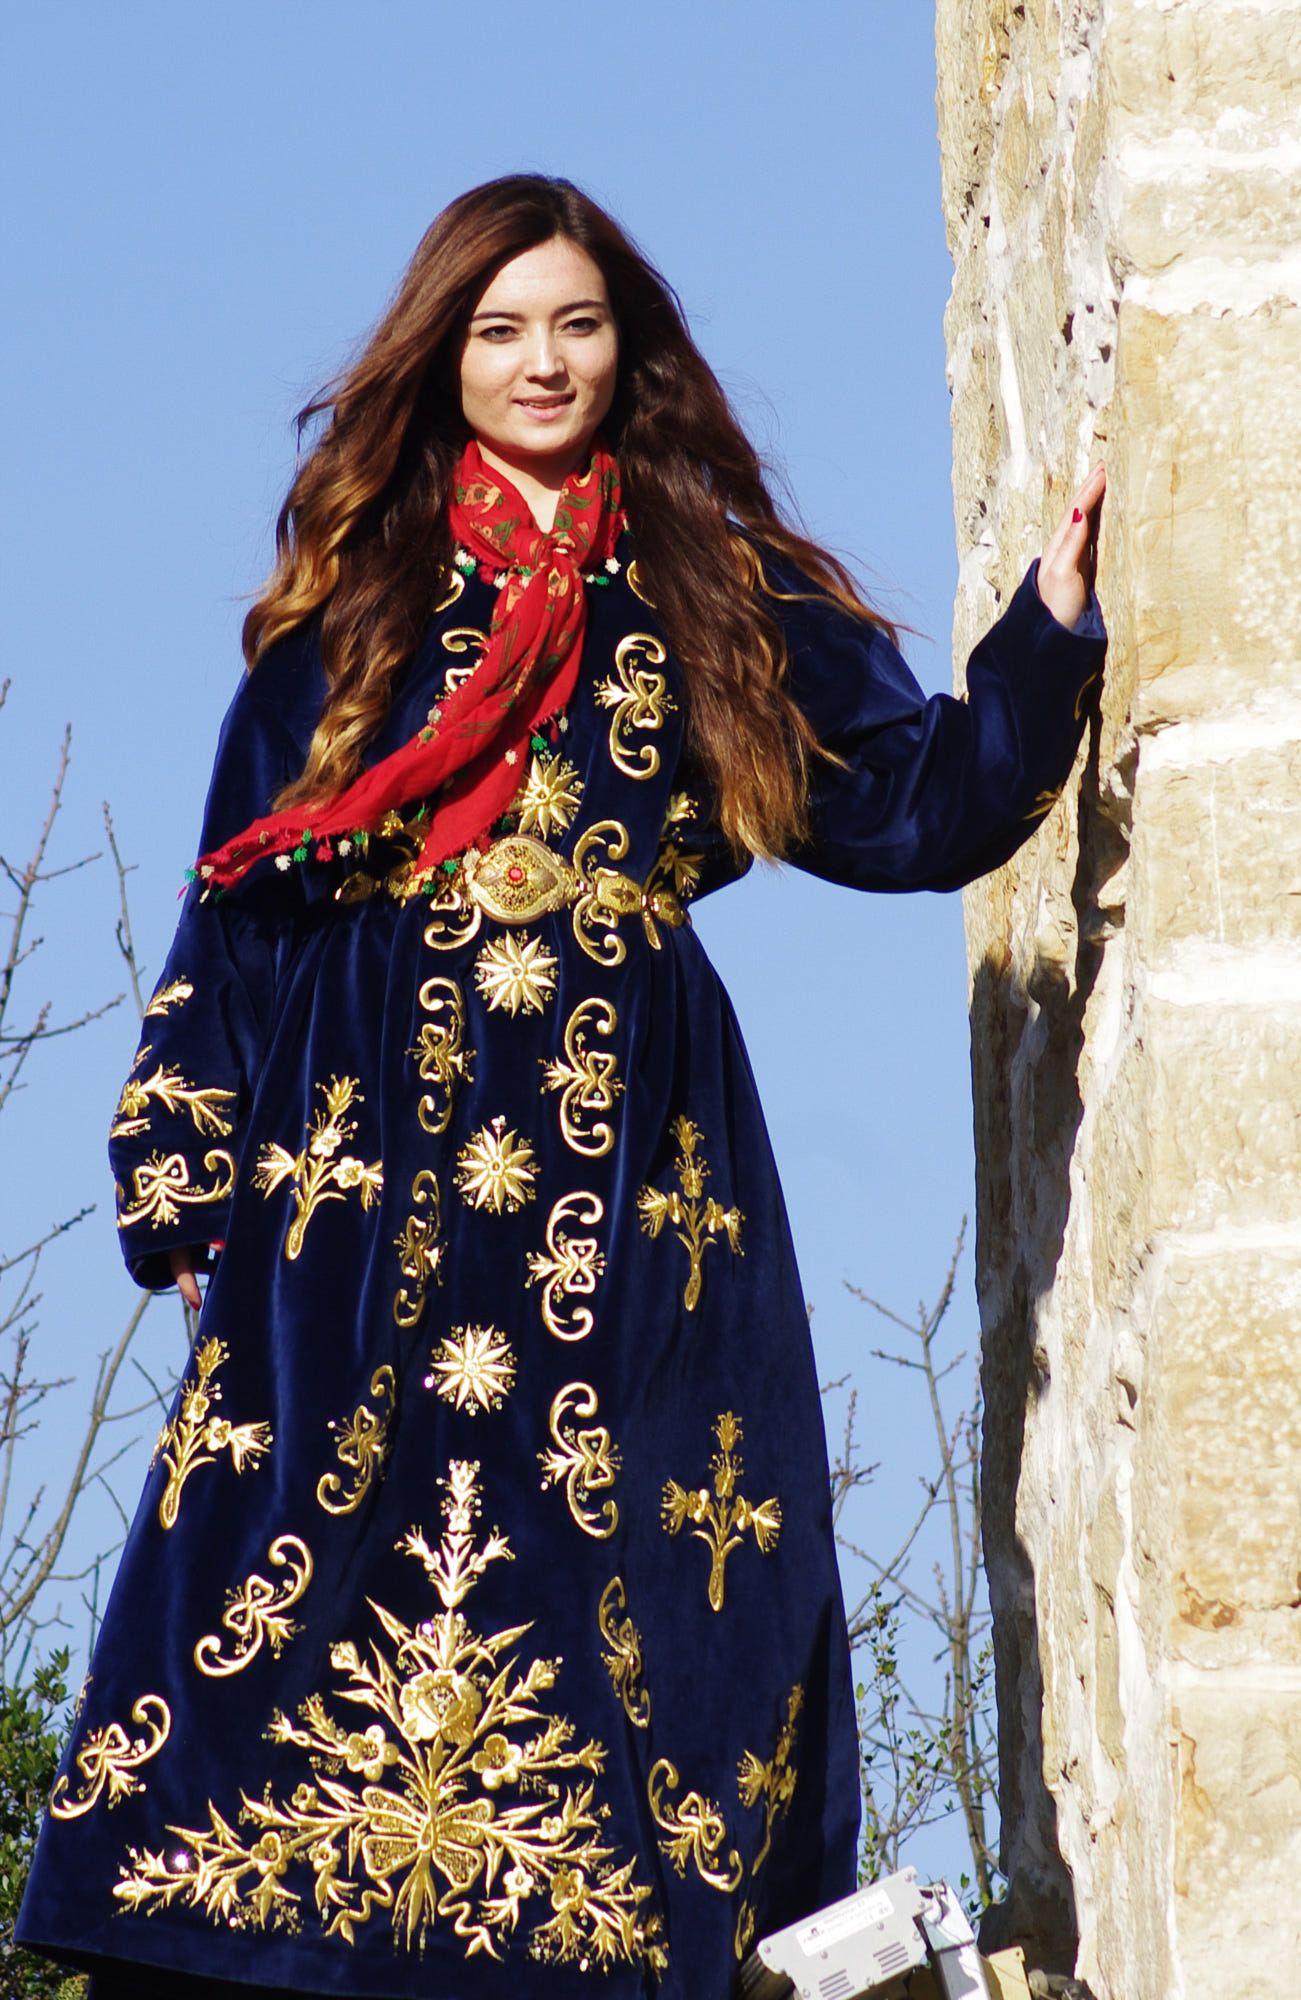 Turkish girl iin traditional bridal dress bindalli from safranbolu